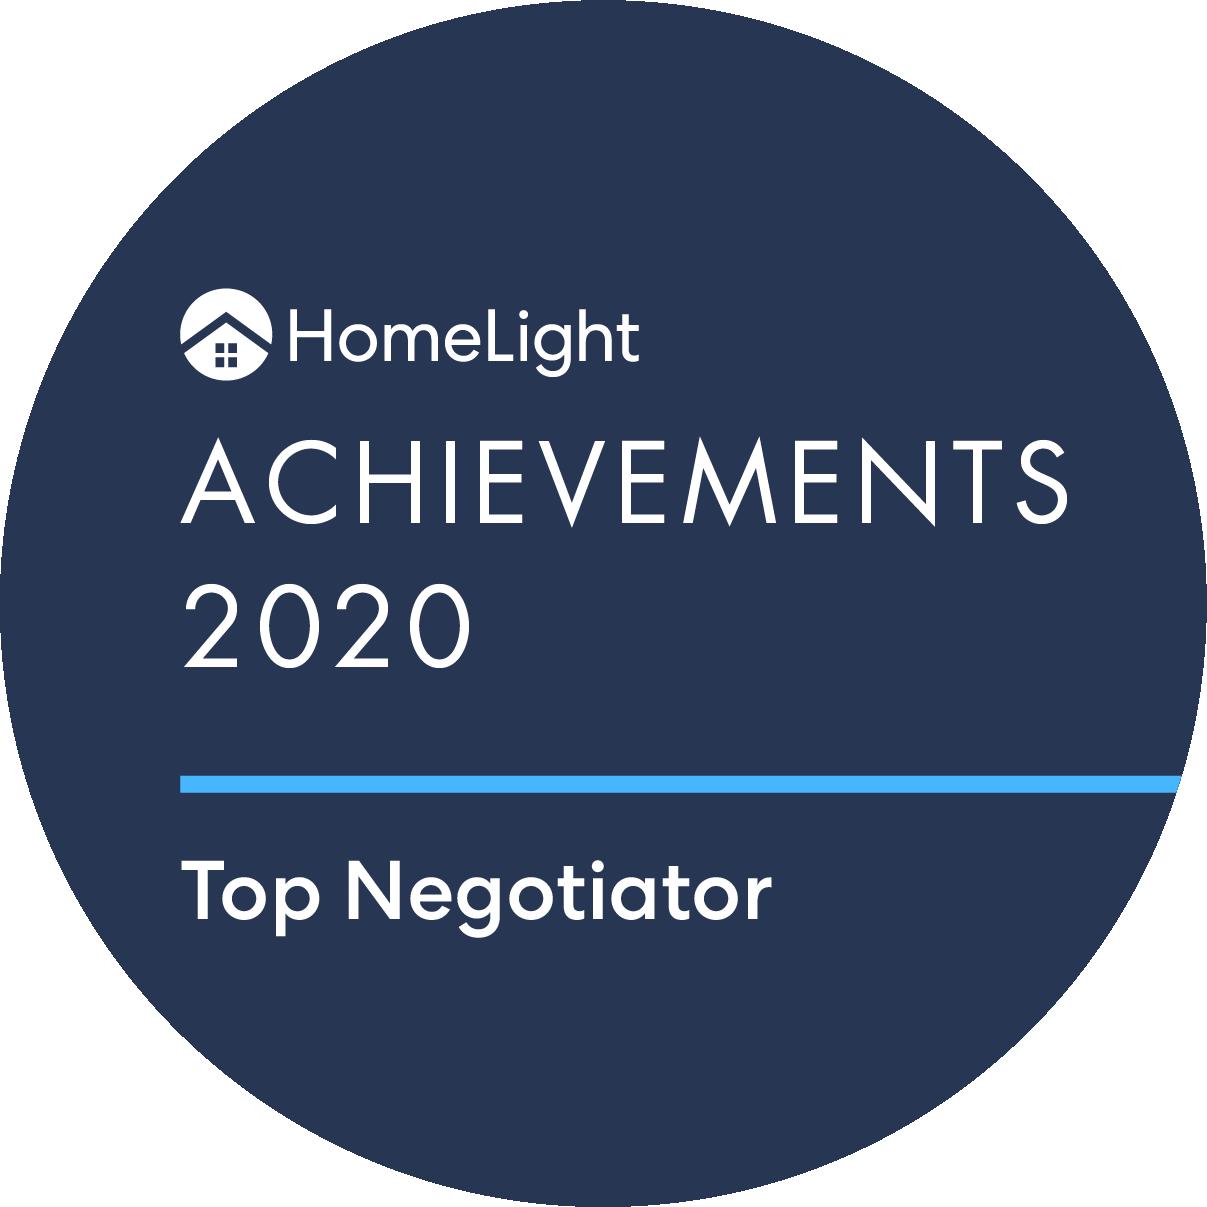 HomeLight Achievement Winner - Misty Morrison - Top Florida Real Estate Agent